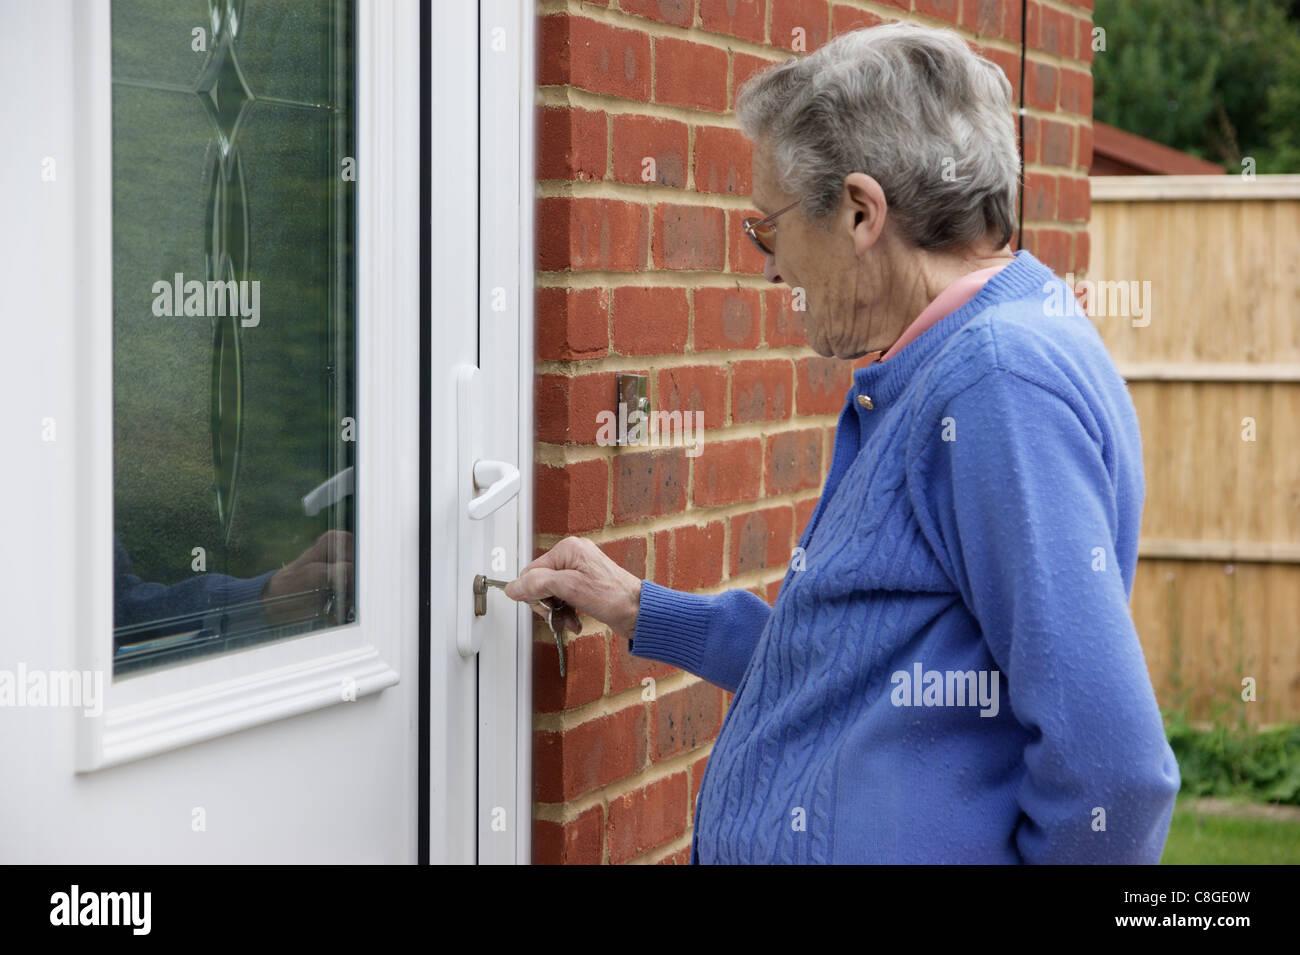 Elderly Woman Locking Unlocking Front Door Stock Photo 39700217